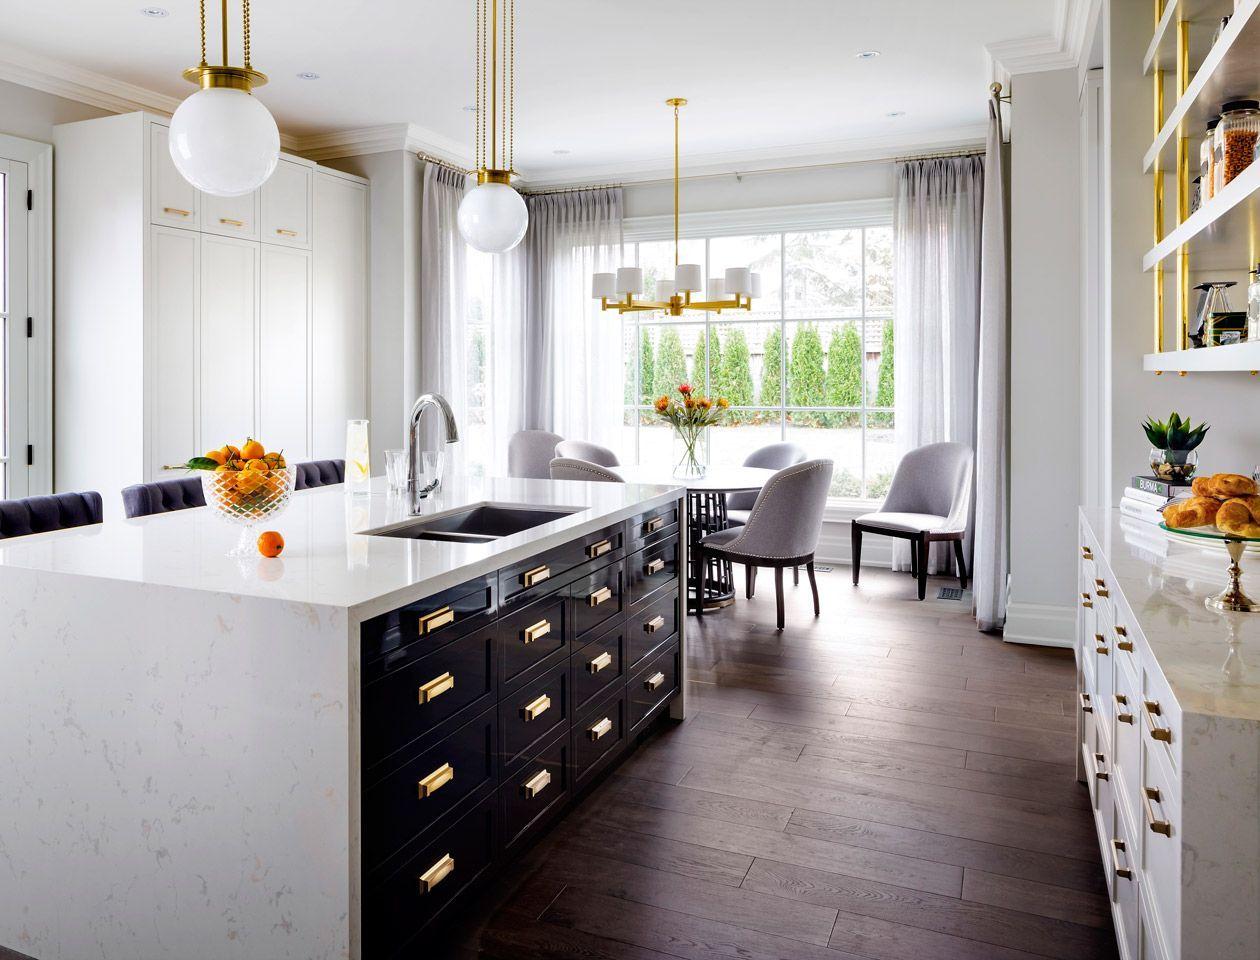 Quarz-küchendesign thinking of ways to make your kitchen more interesting keep the